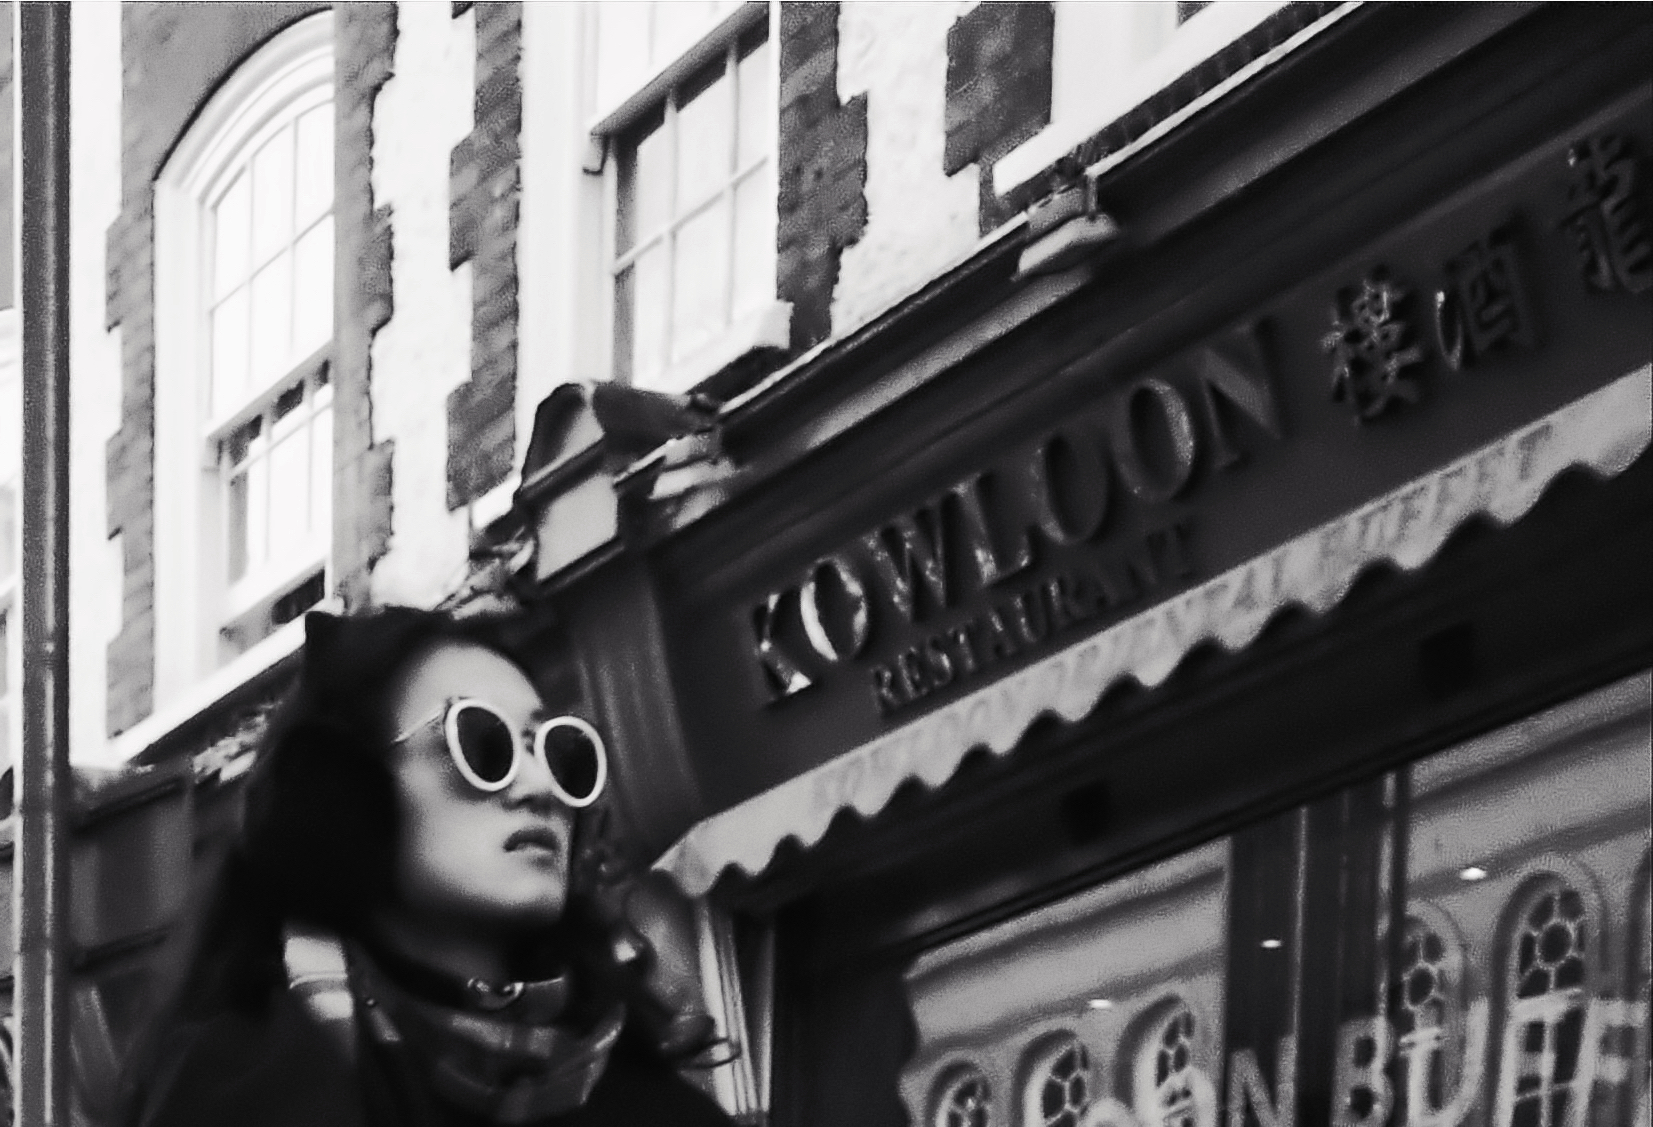 Chinatown, London, November 2016